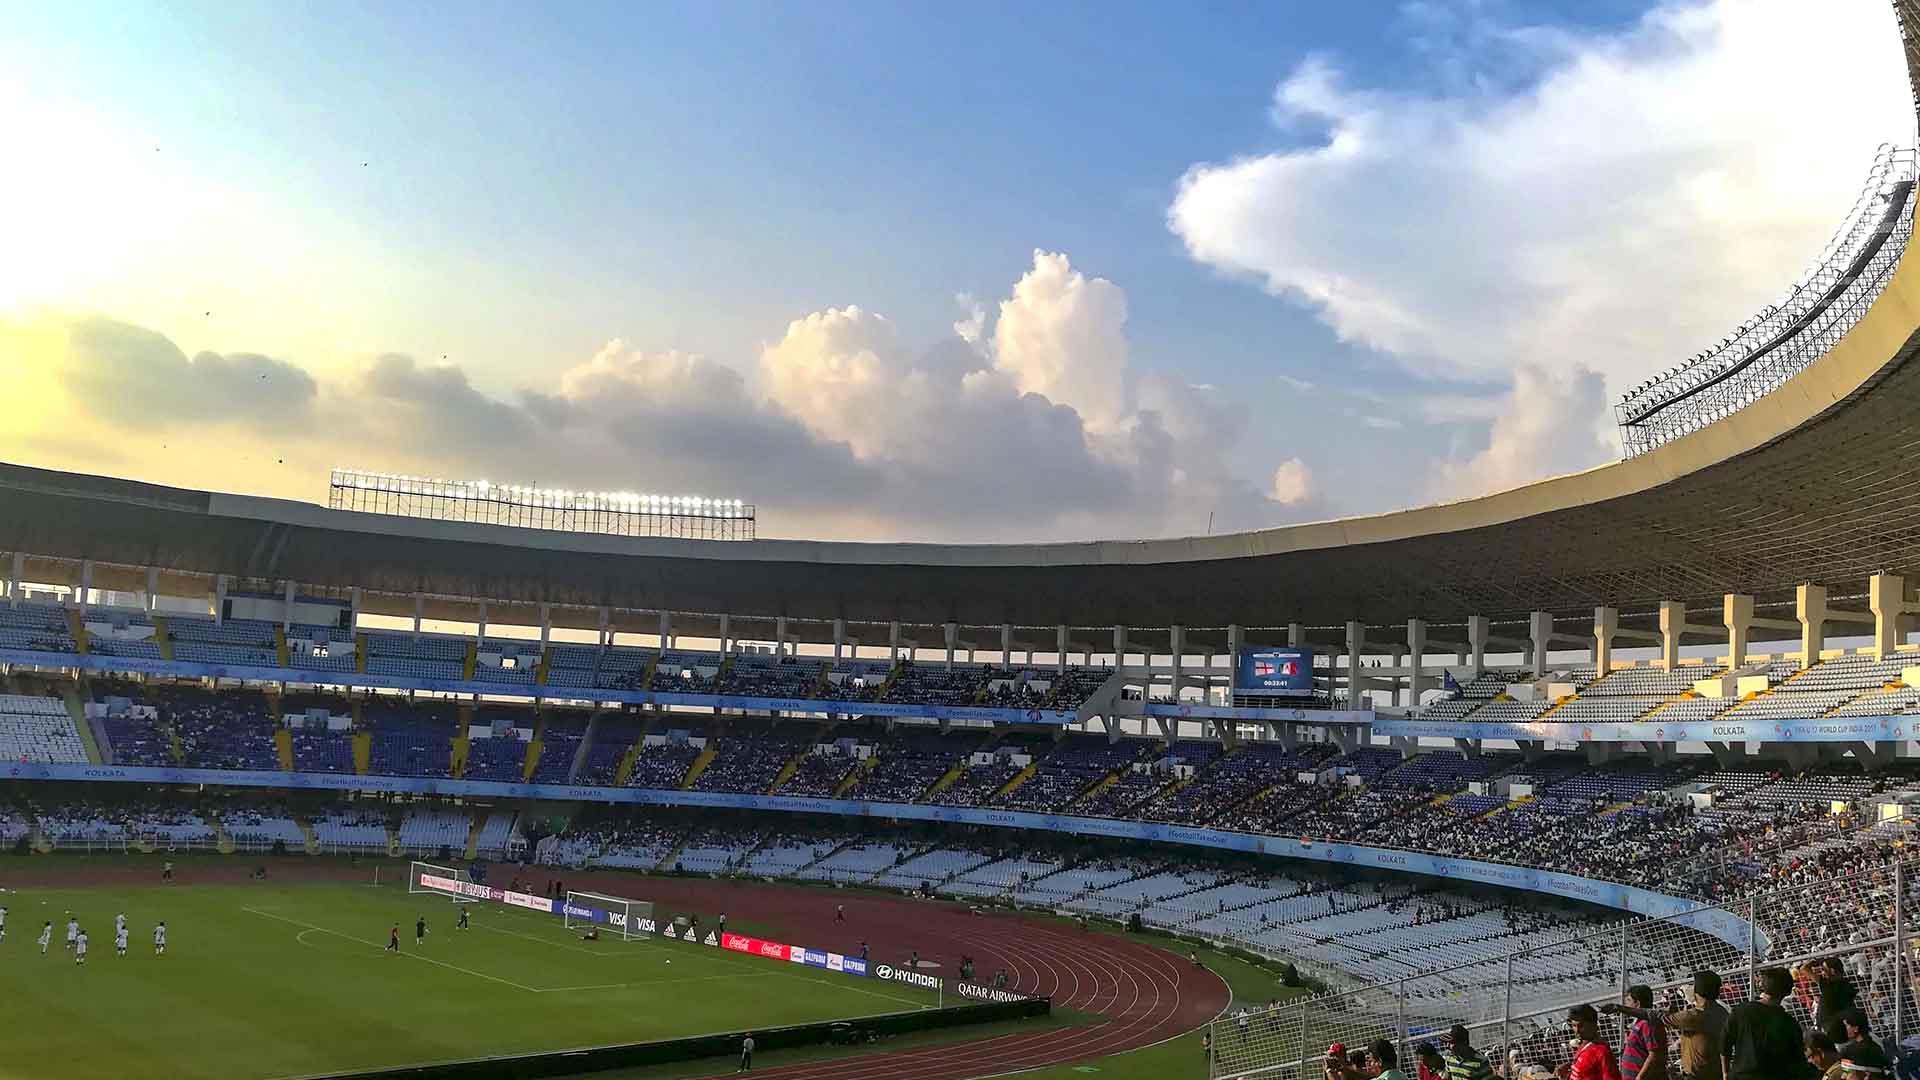 maiores estadios do mundo estadio salt lake